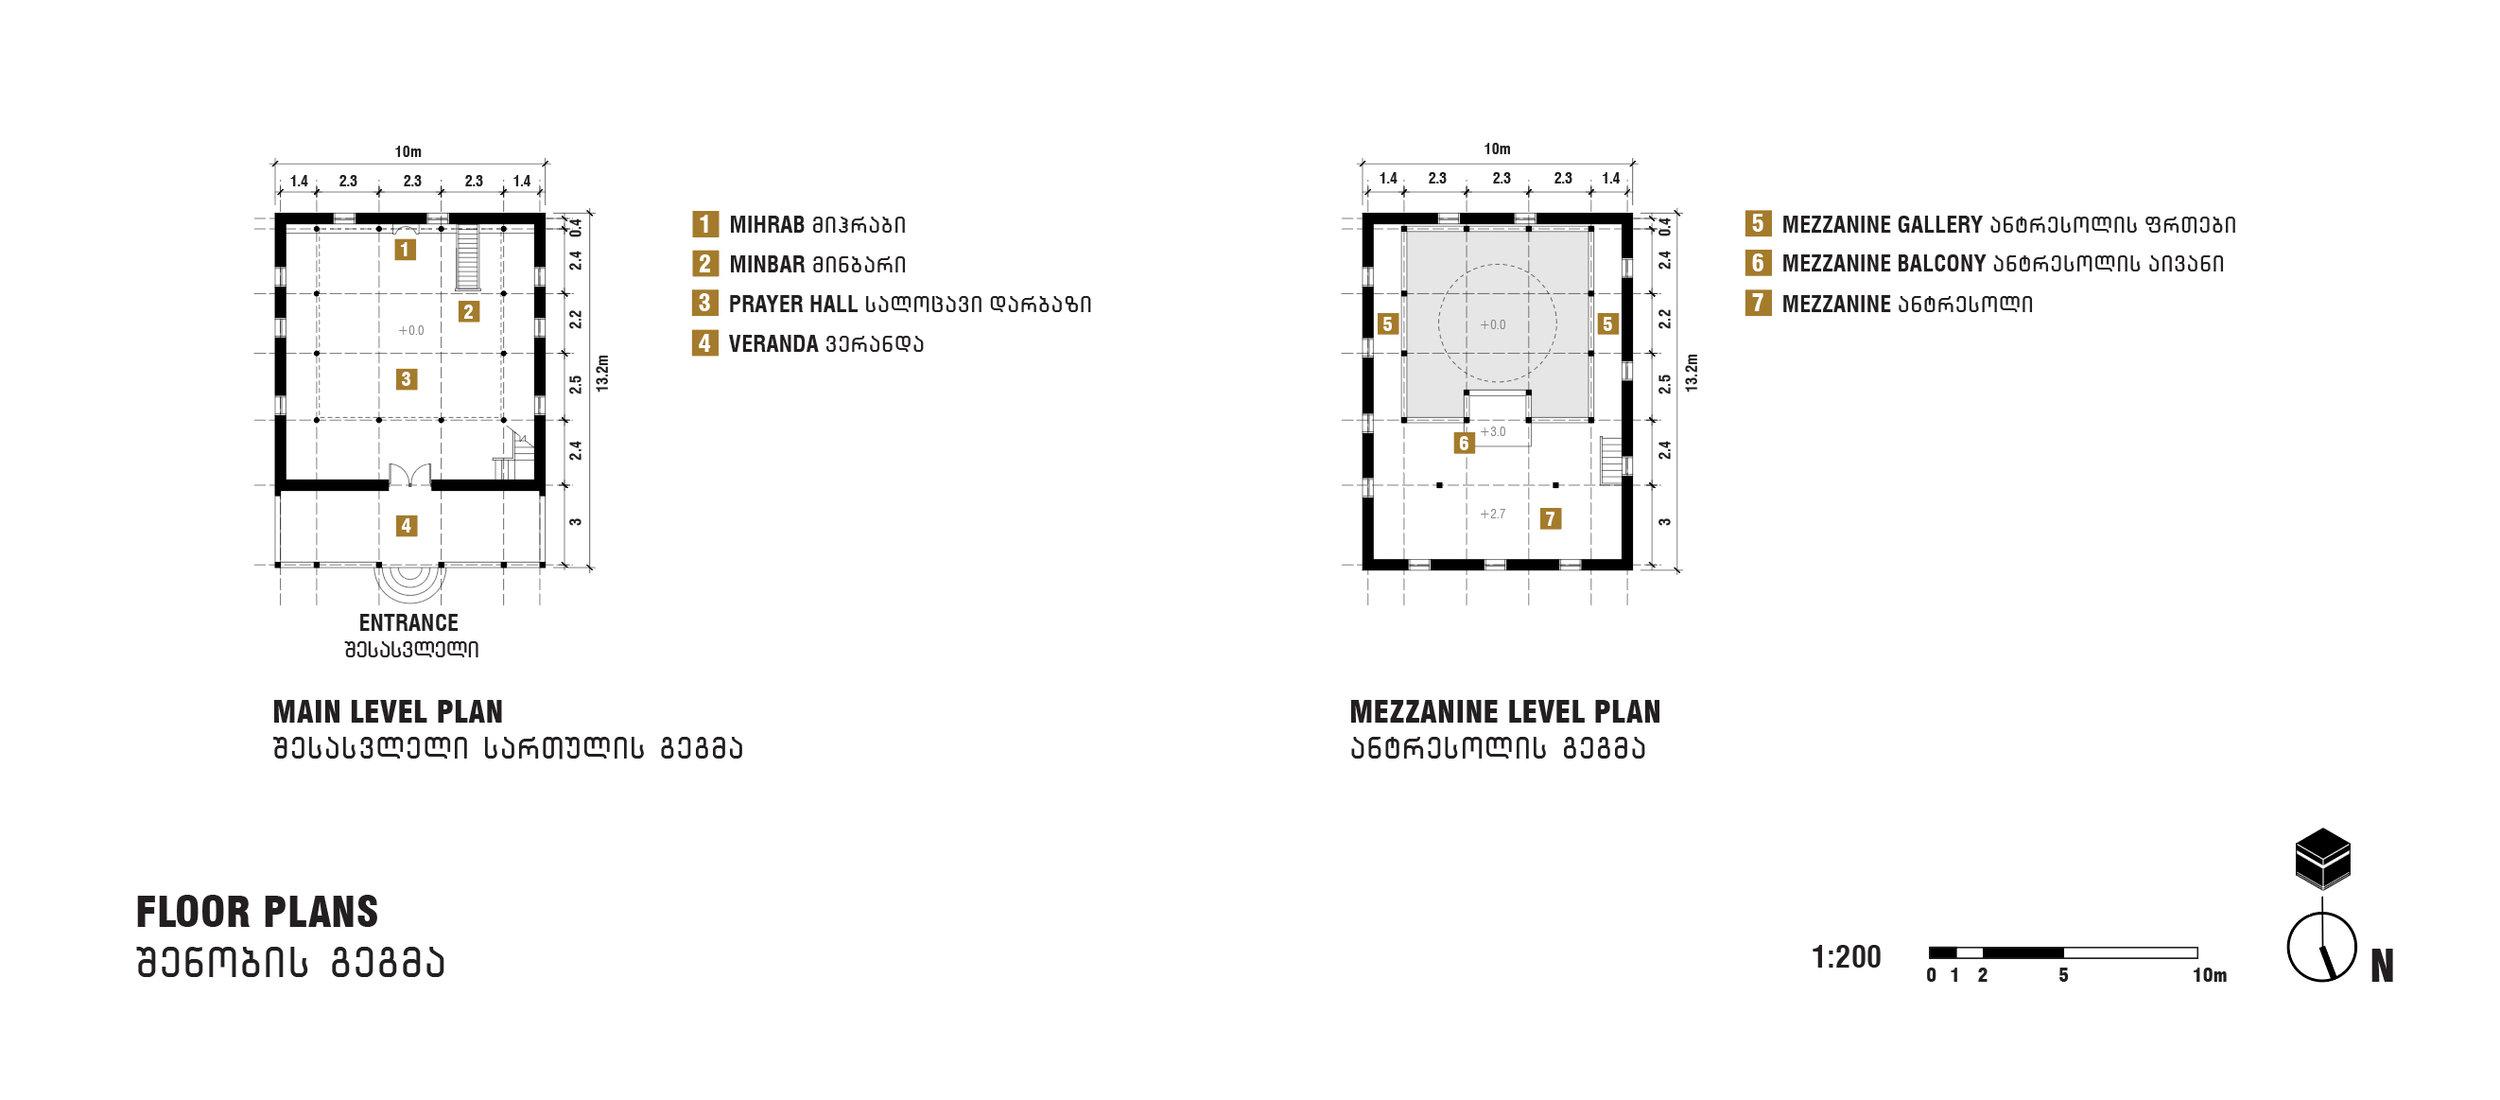 PIRIVELI MAISI_Floorplans 1-200 copy.jpg